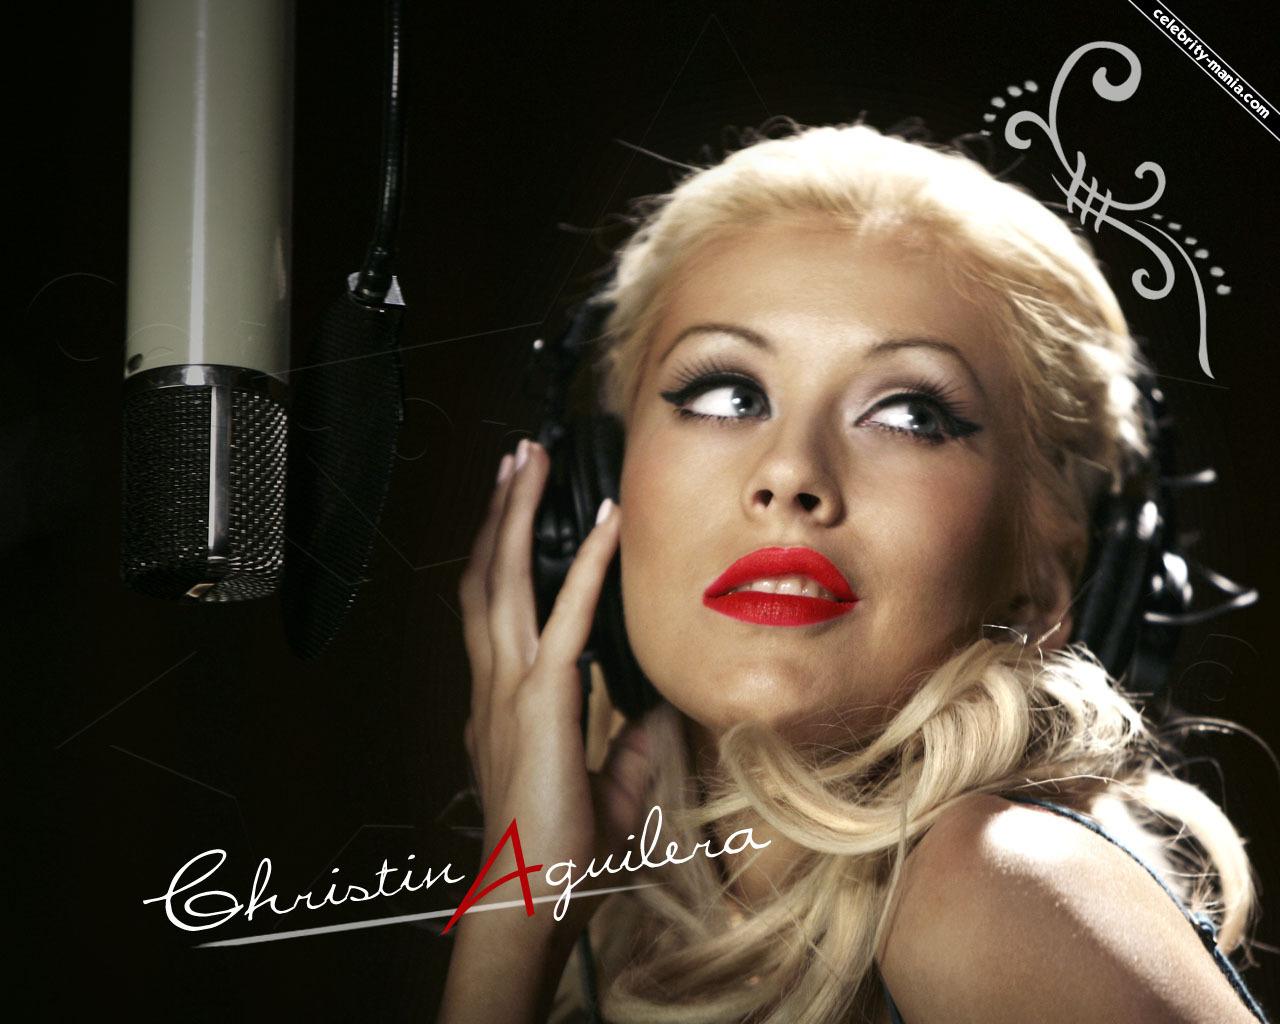 http://4.bp.blogspot.com/_SVQ2Vt21oX8/TF_b9PryOWI/AAAAAAAAARI/WYE_a0sdFXA/s1600/Christina-christina-aguilera-982343_1280_1024.jpg